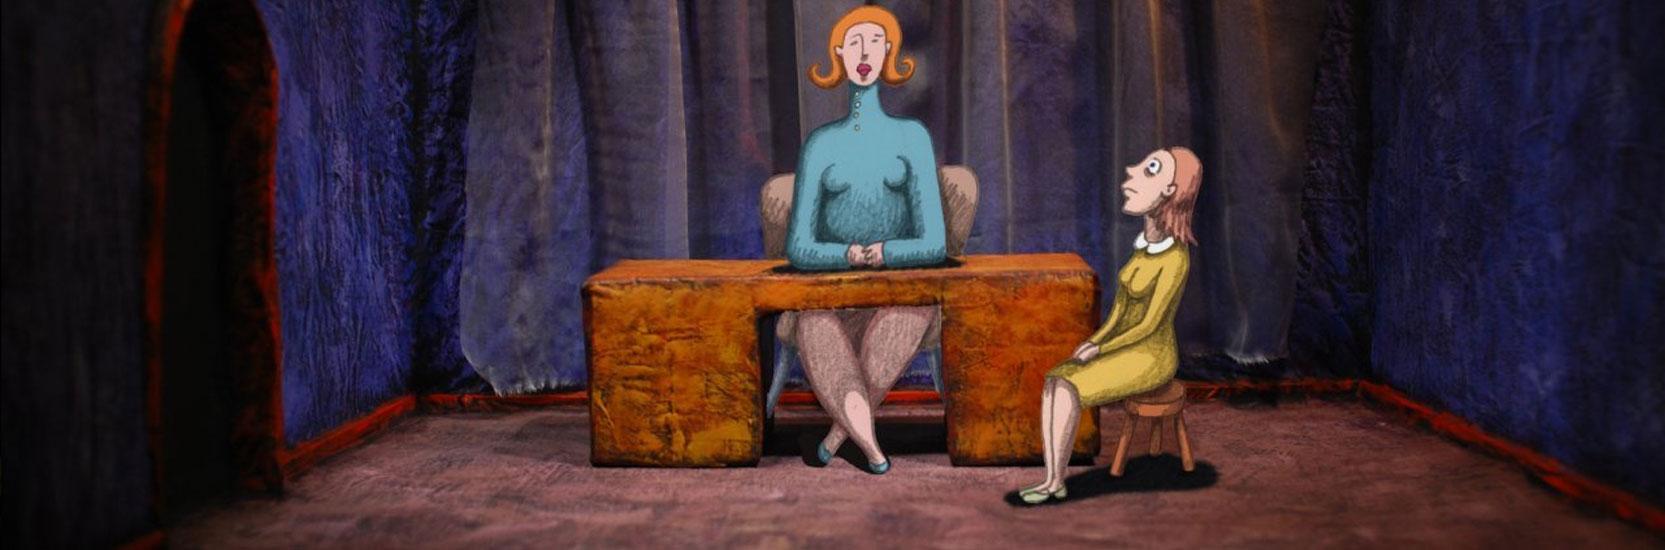 "Interview – Signe Baumane, réalisatrice de ""Rocks in my pockets"""